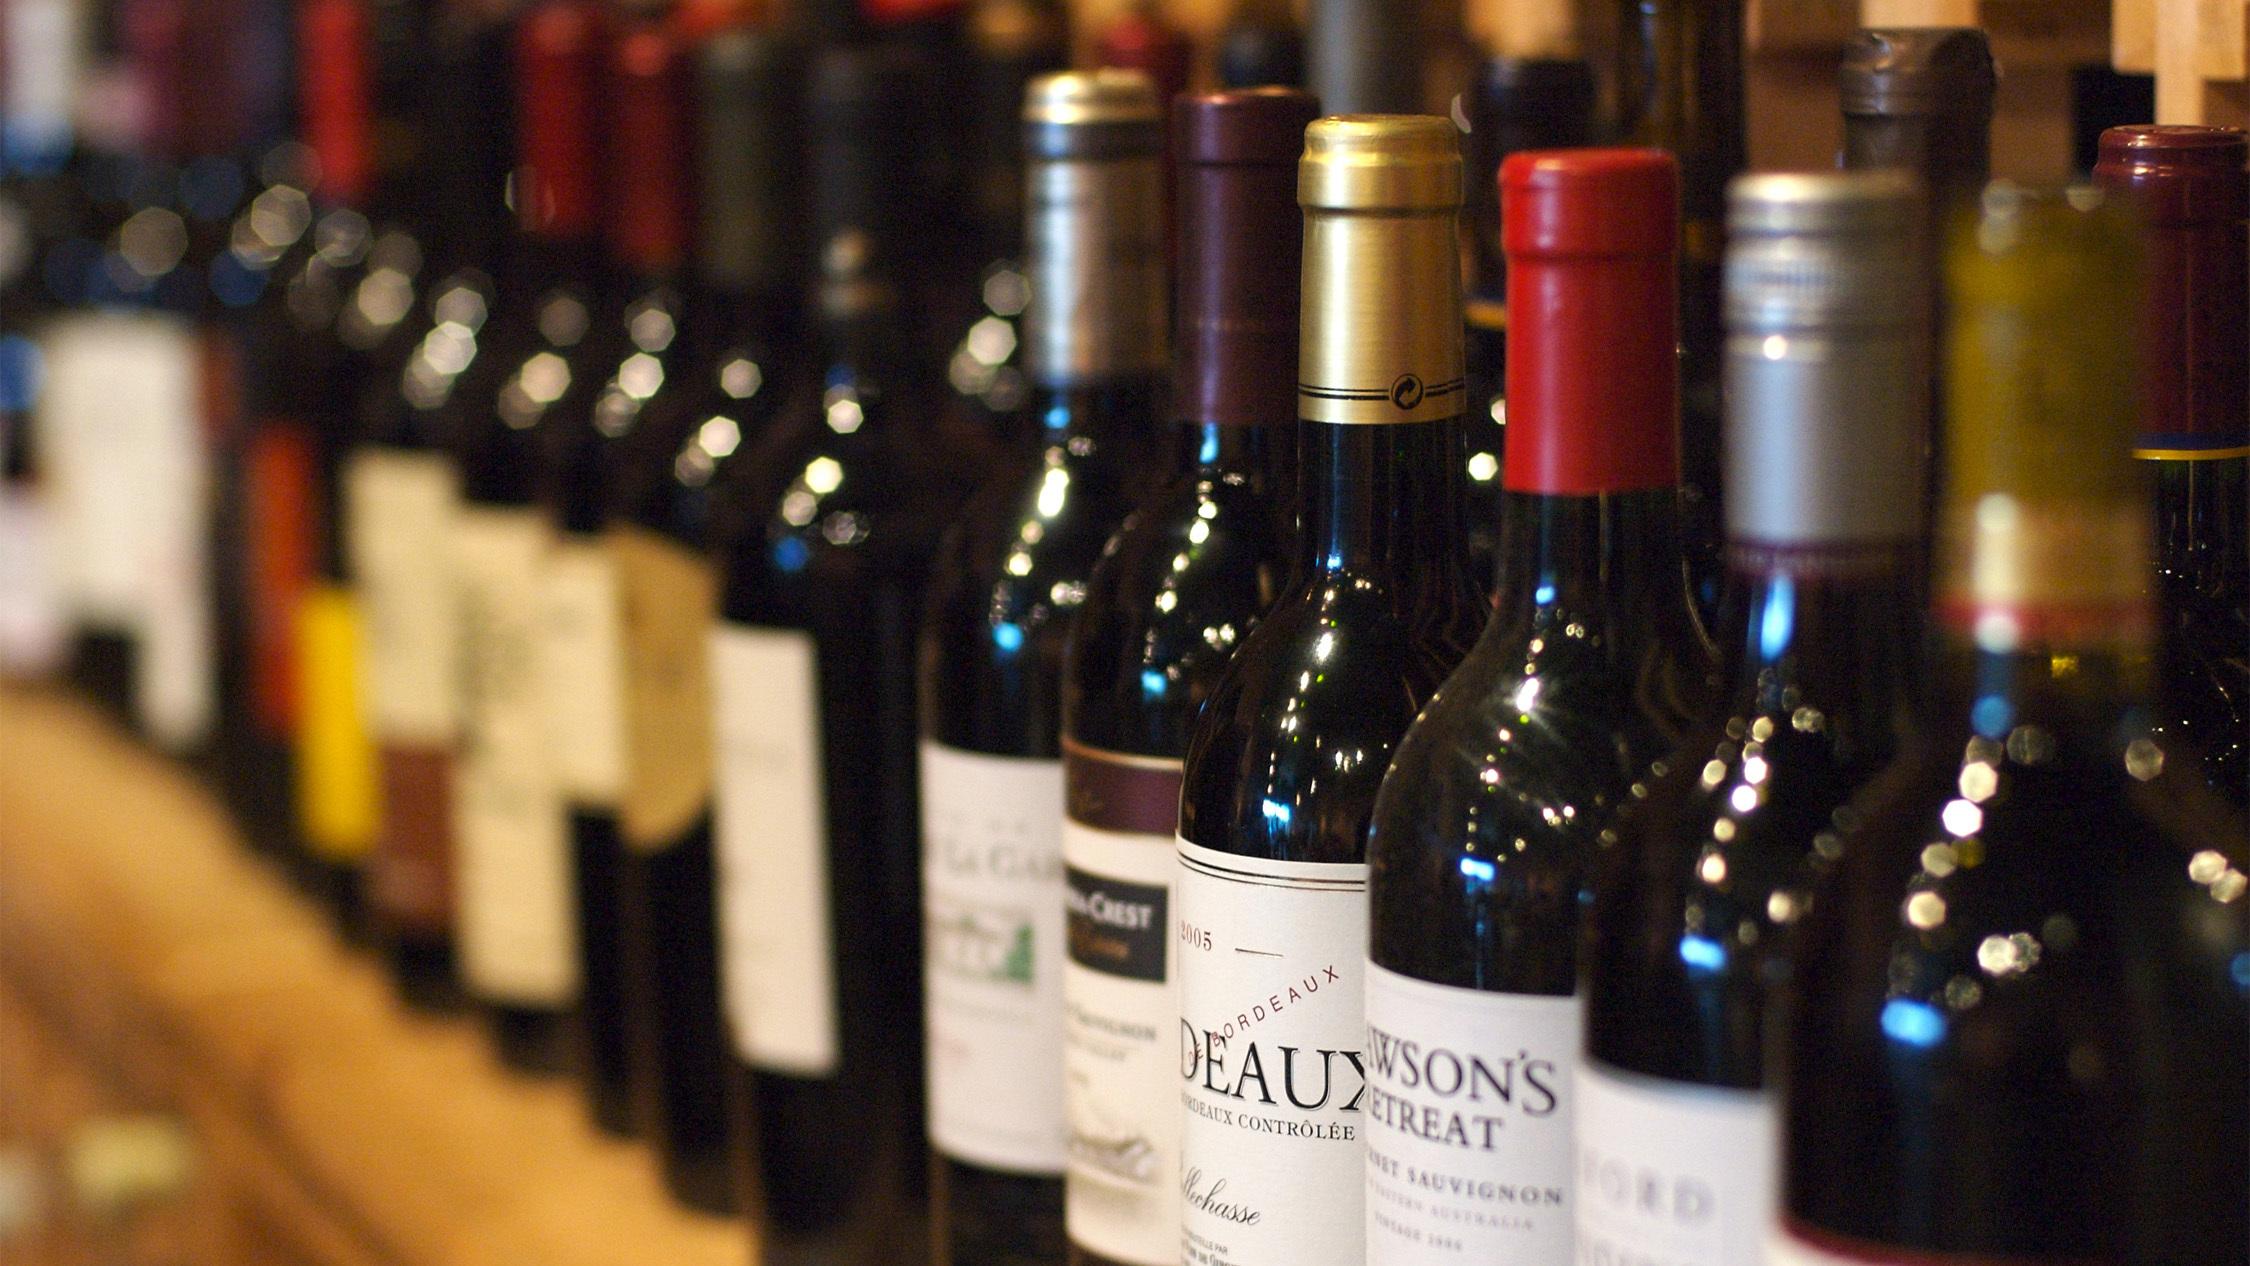 Generic wine bottles